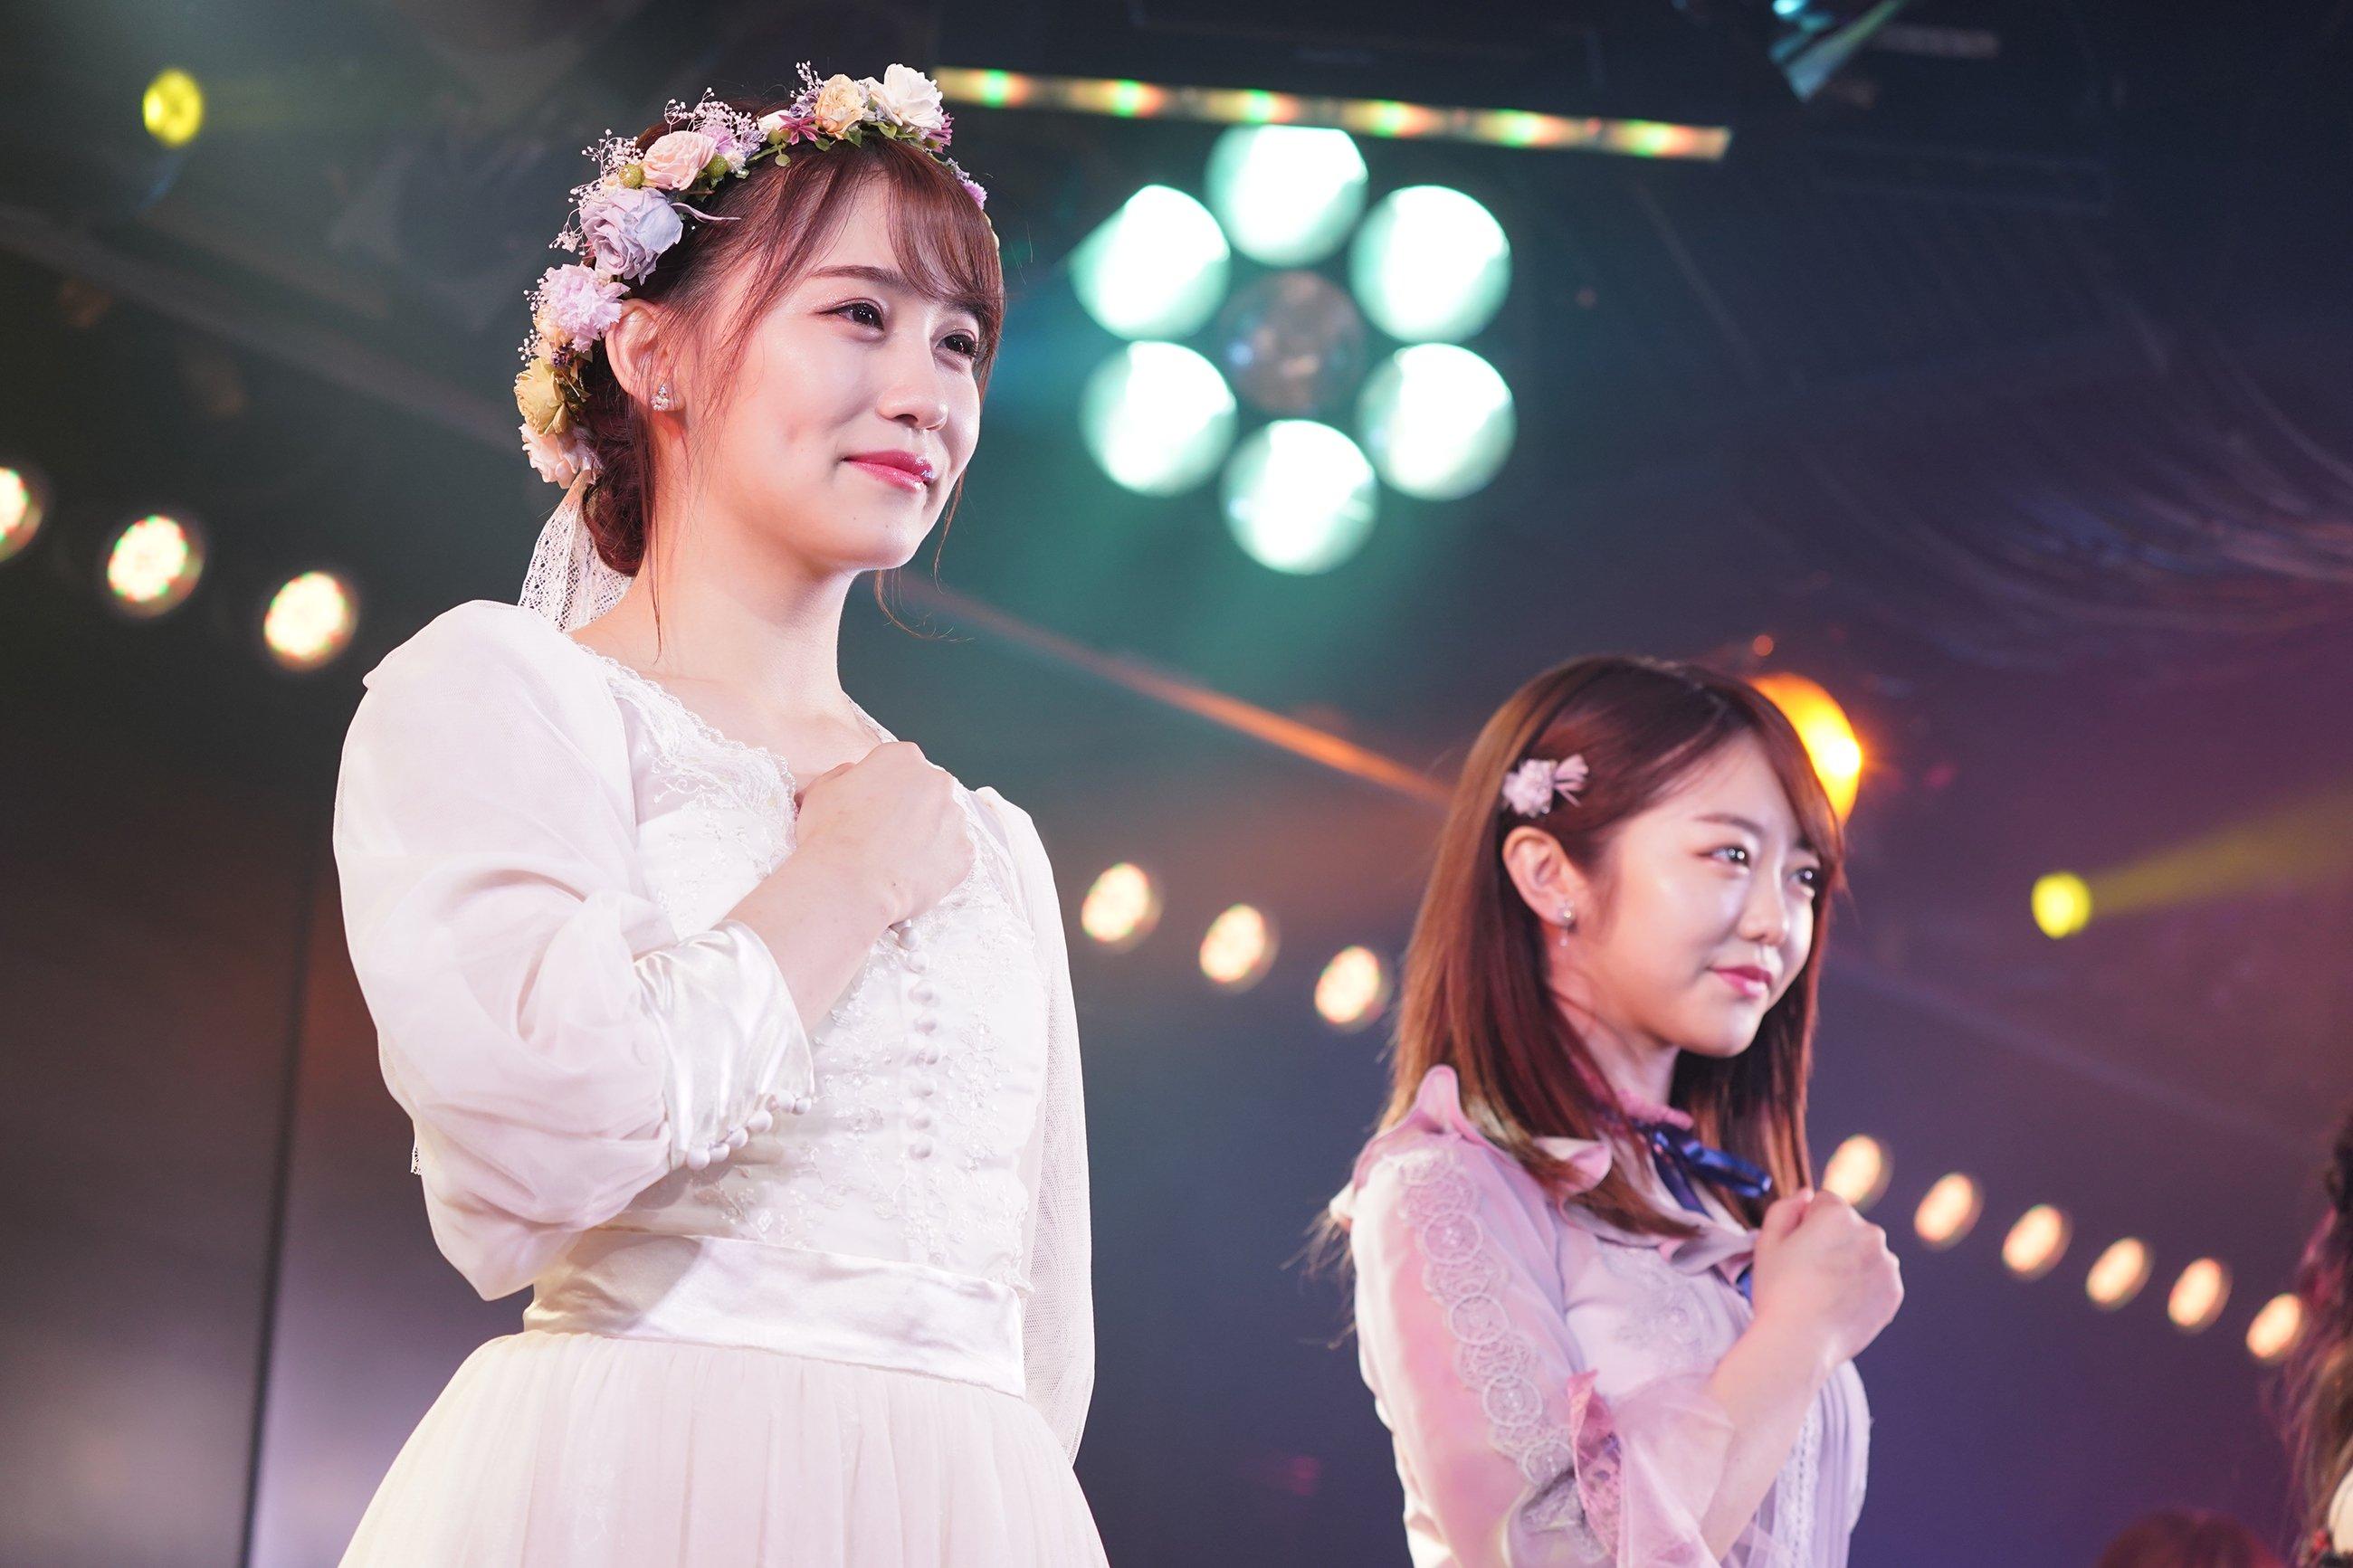 AKB48小嶋真子「みんなの笑顔が私のエネルギー」笑顔で卒業【写真10枚】の画像007